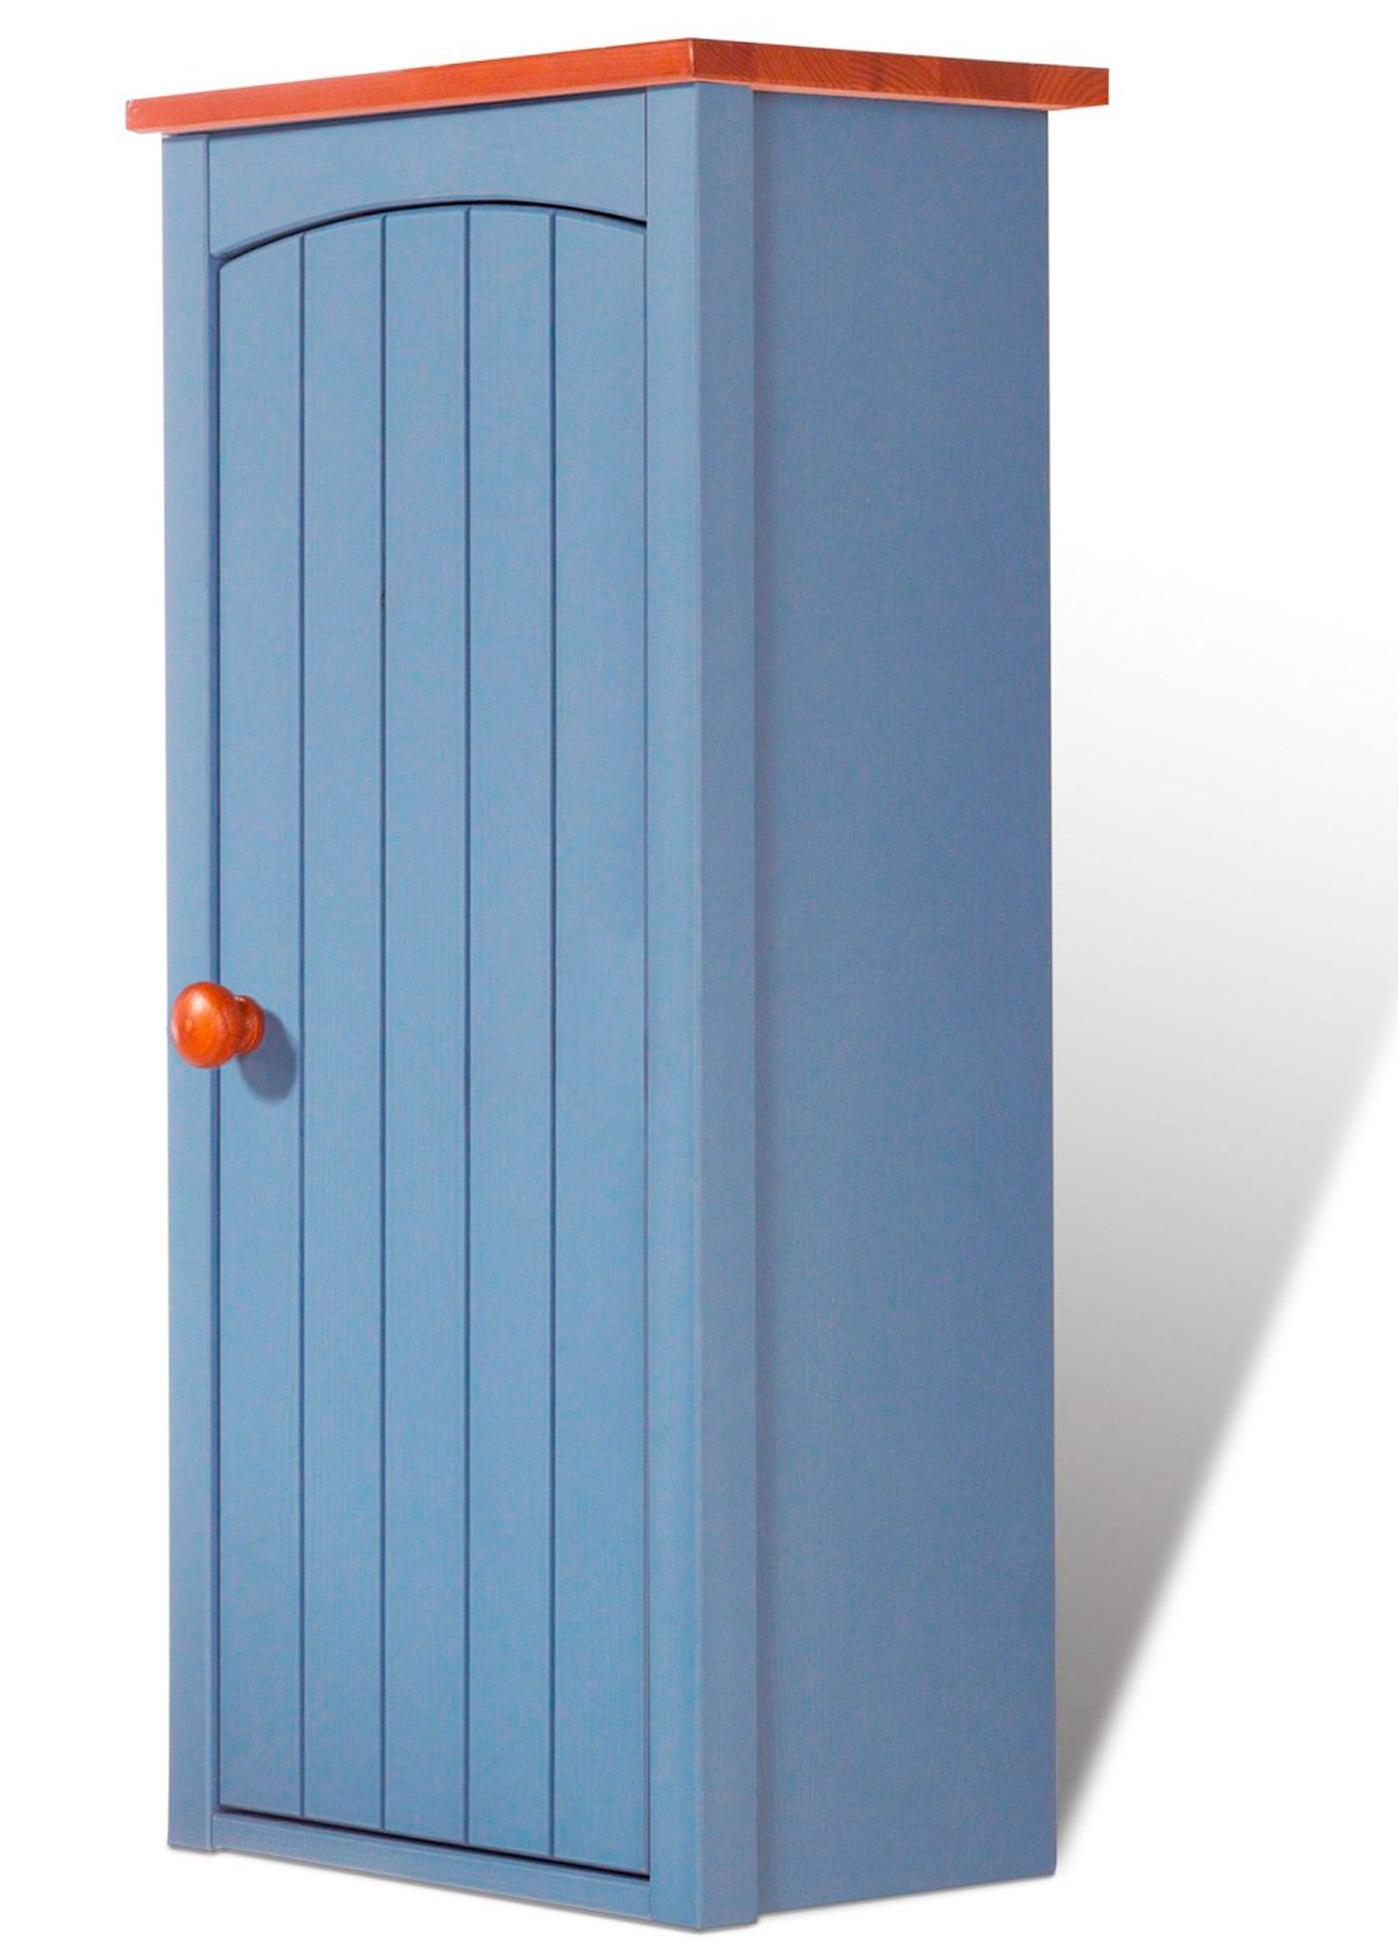 Image of Badezimmer Hängeschrank